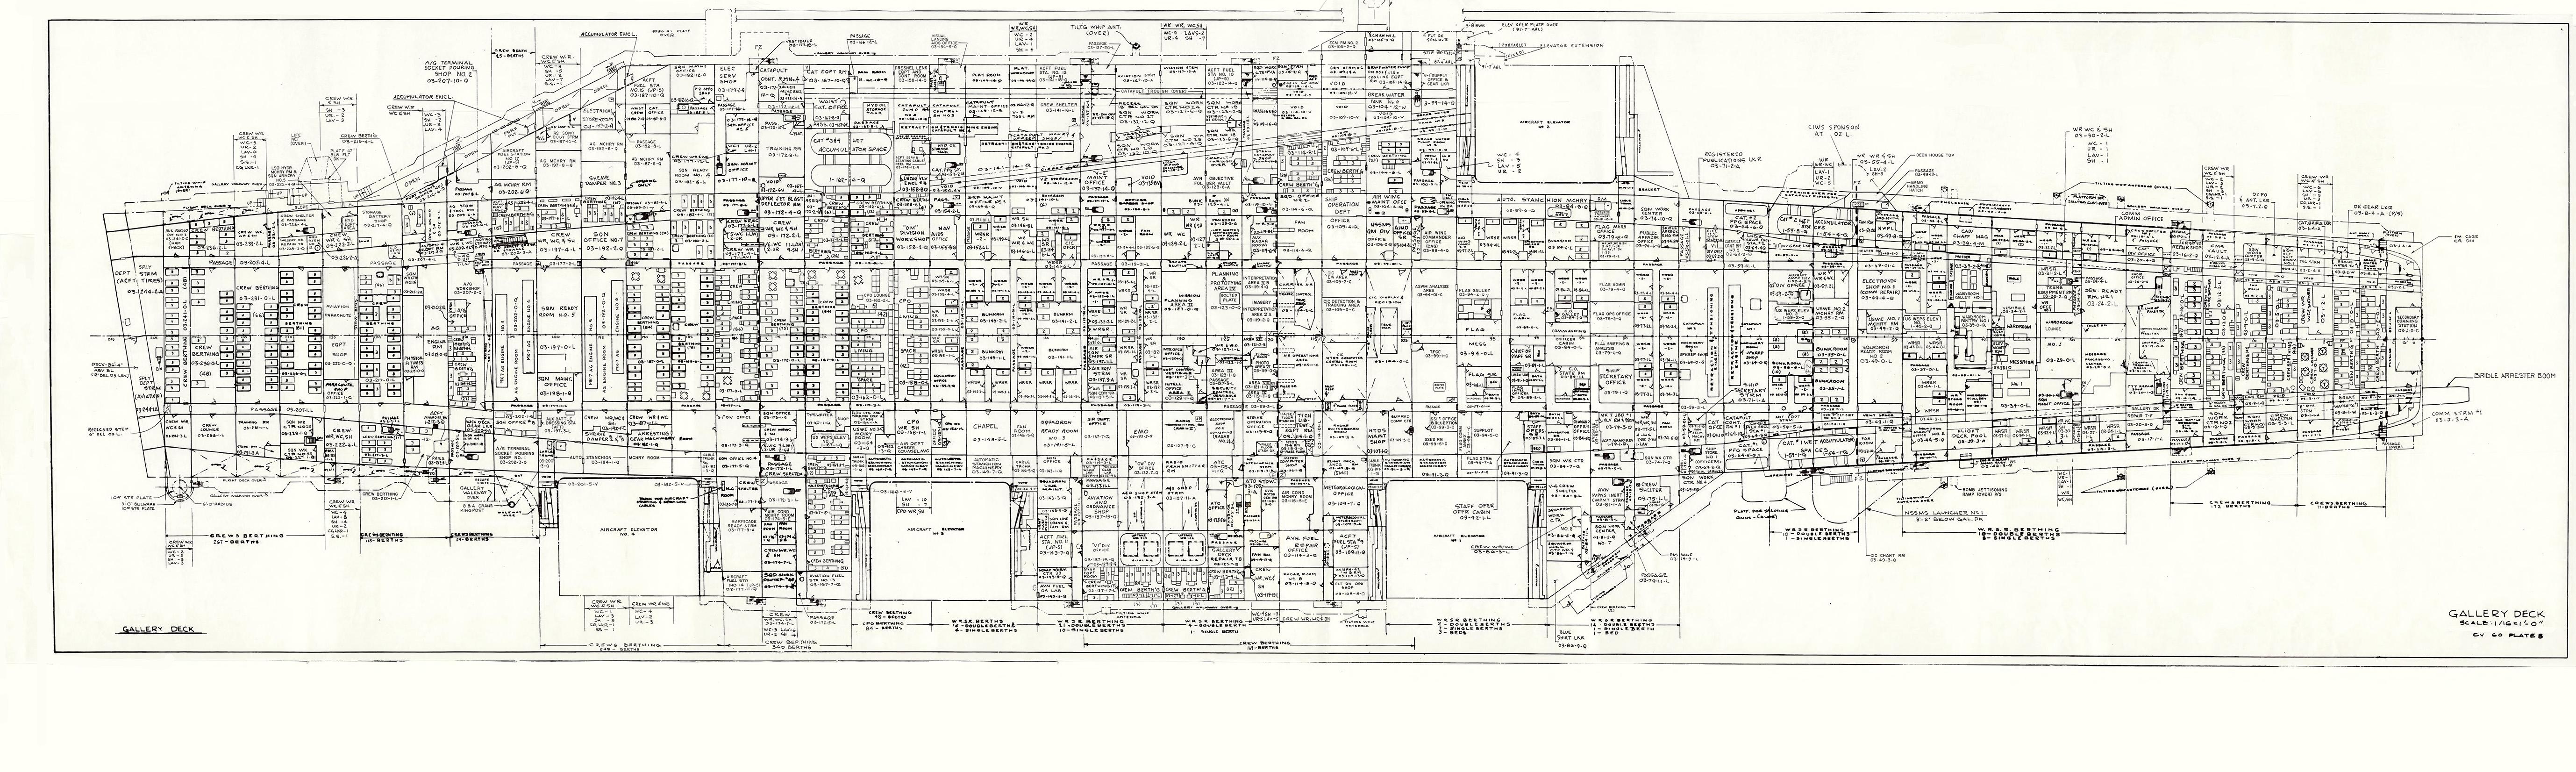 Aircraft Carrier Floor Plan Hms Queen Elizabeth